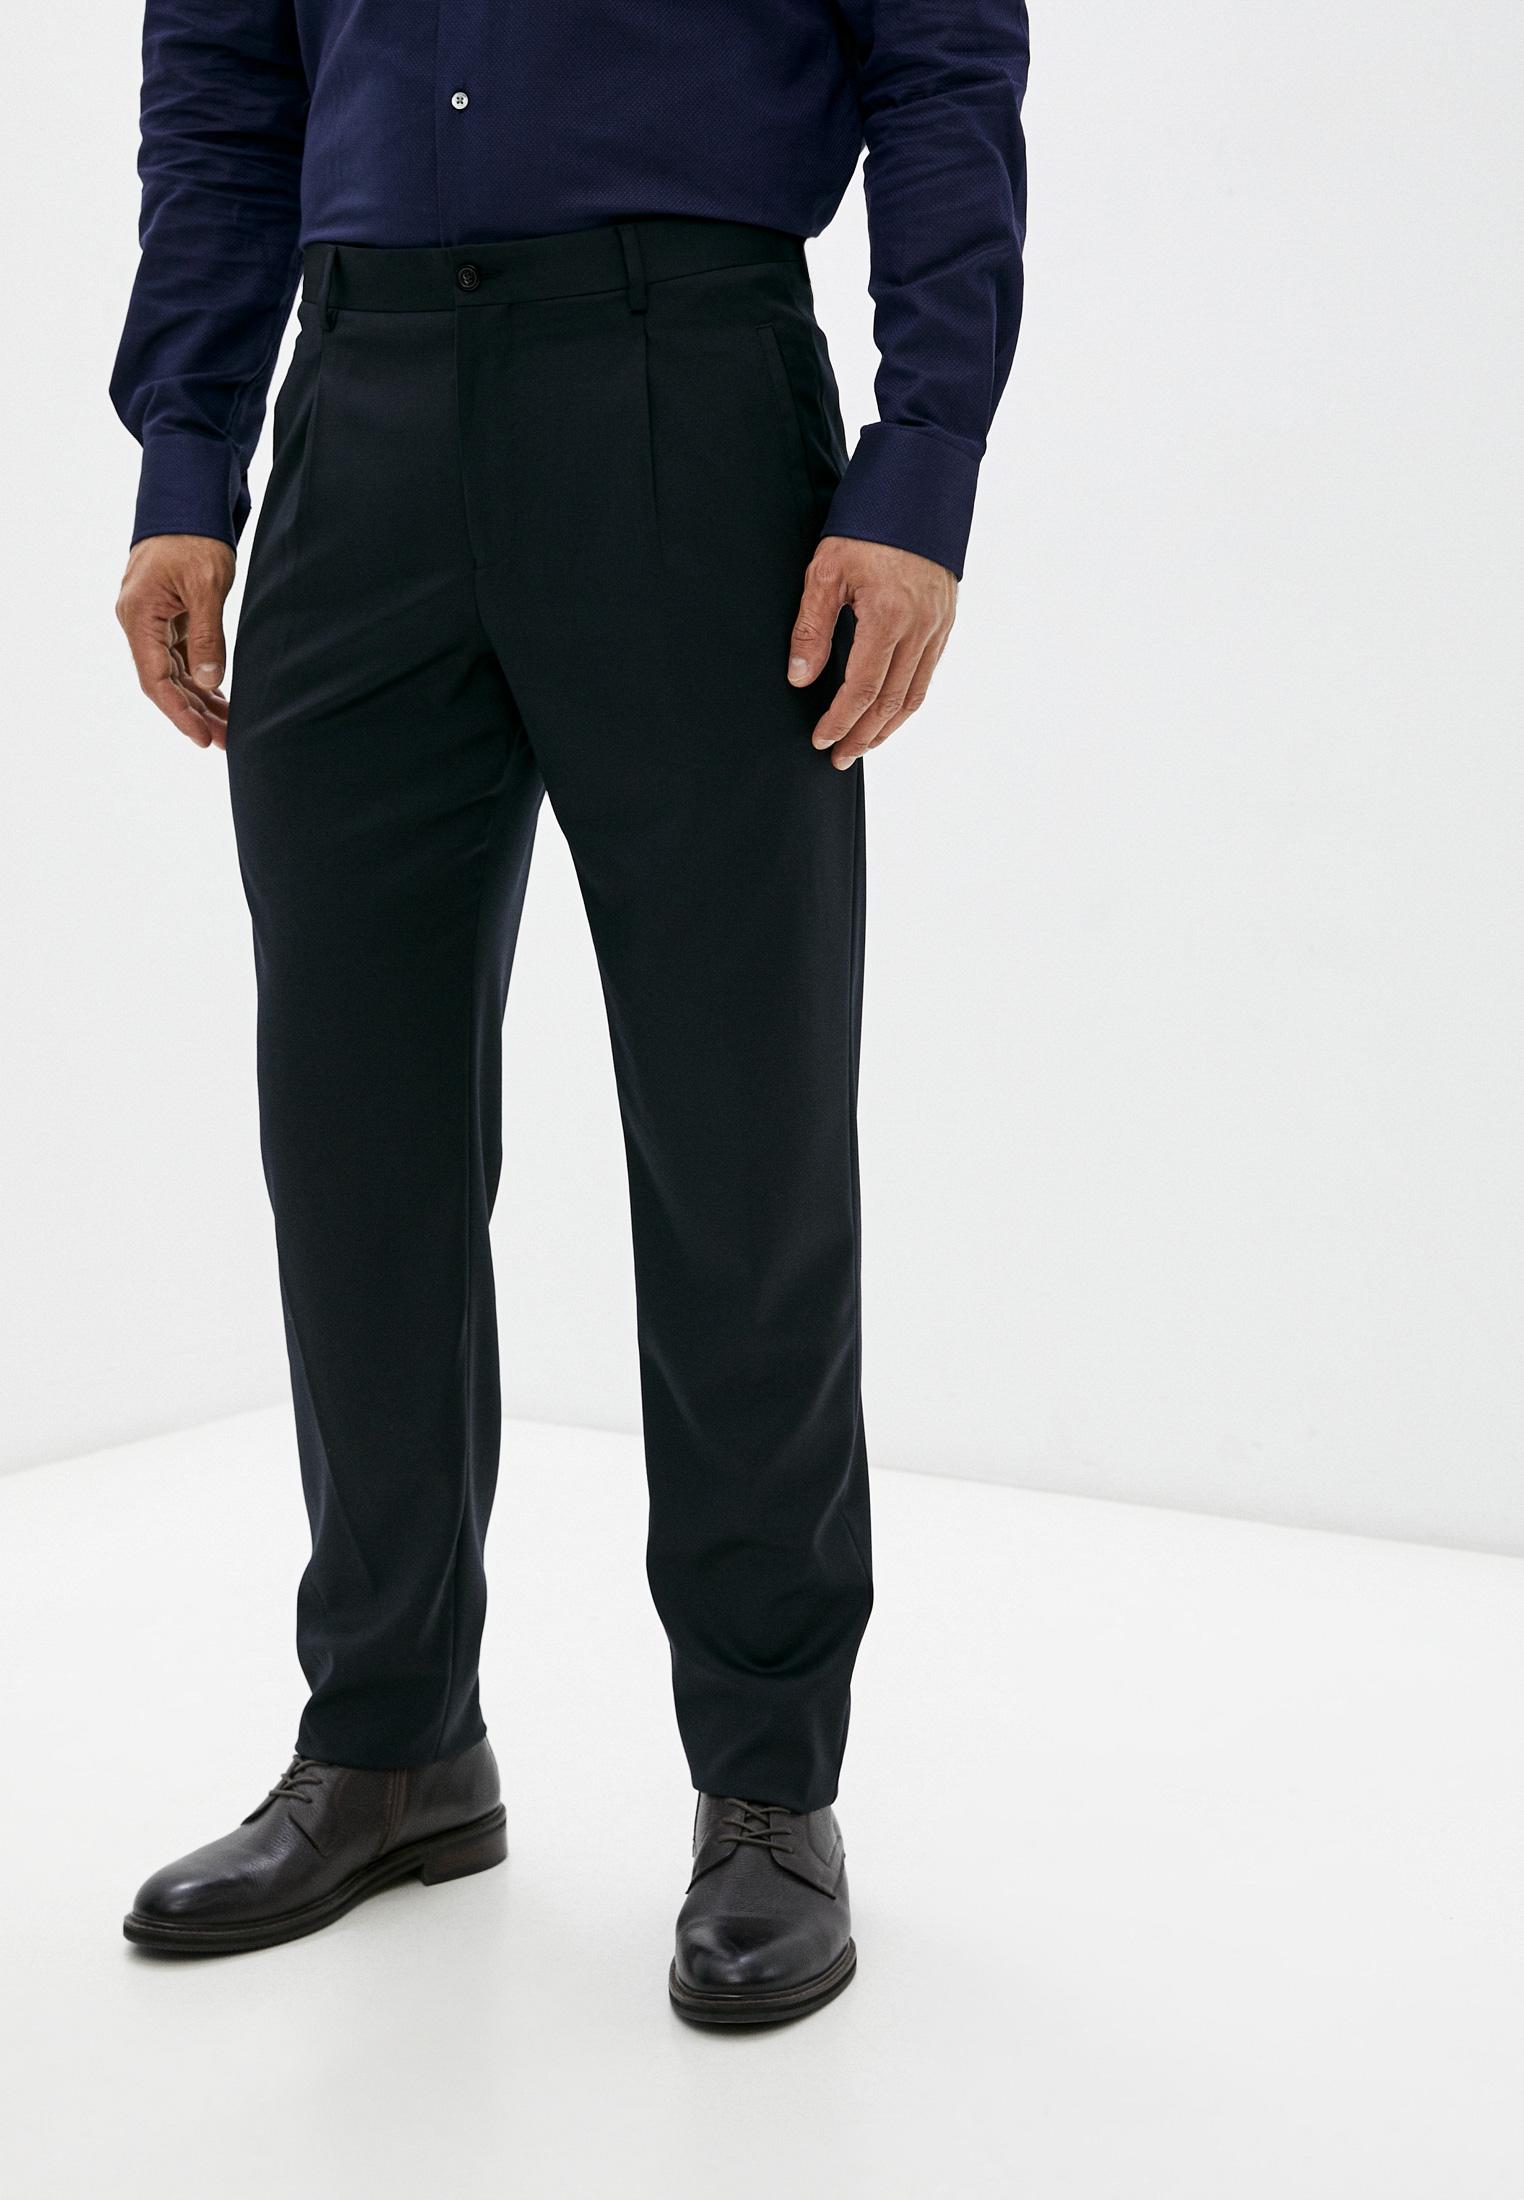 Мужские классические брюки Emporio Armani (Эмпорио Армани) W1P210 W1026